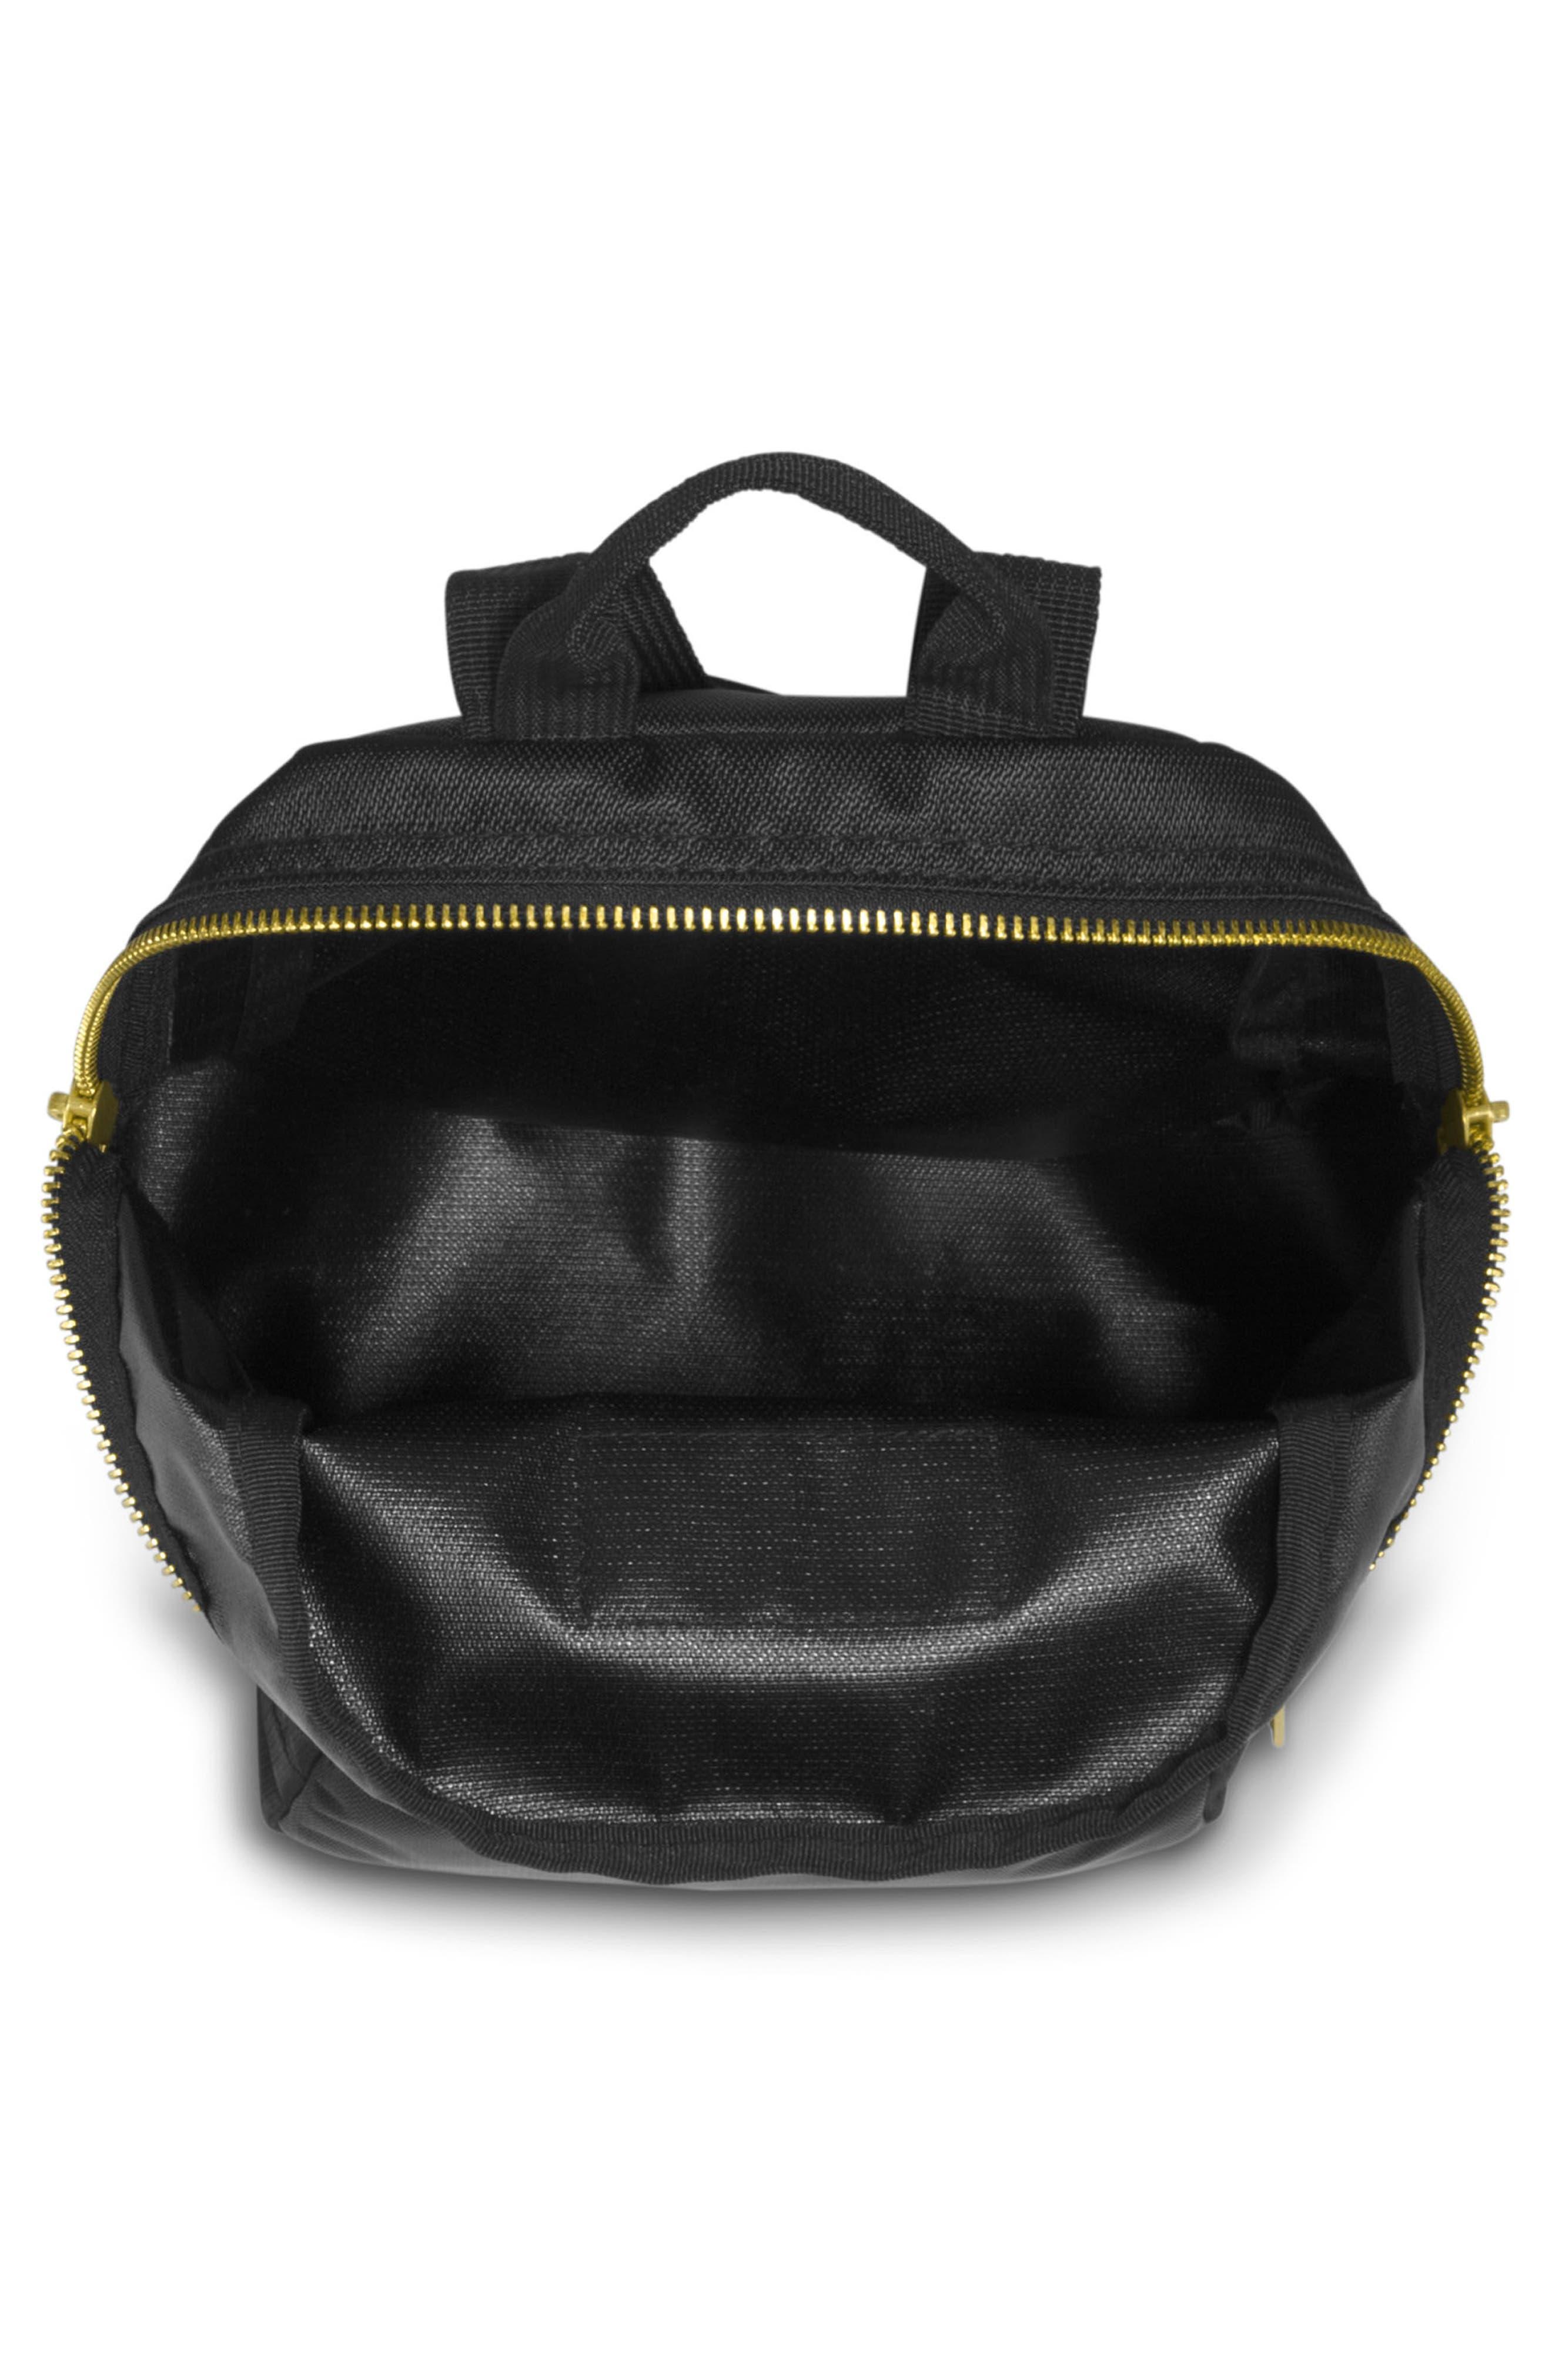 Half Pint FX Backpack,                             Alternate thumbnail 4, color,                             BLACK GOLD